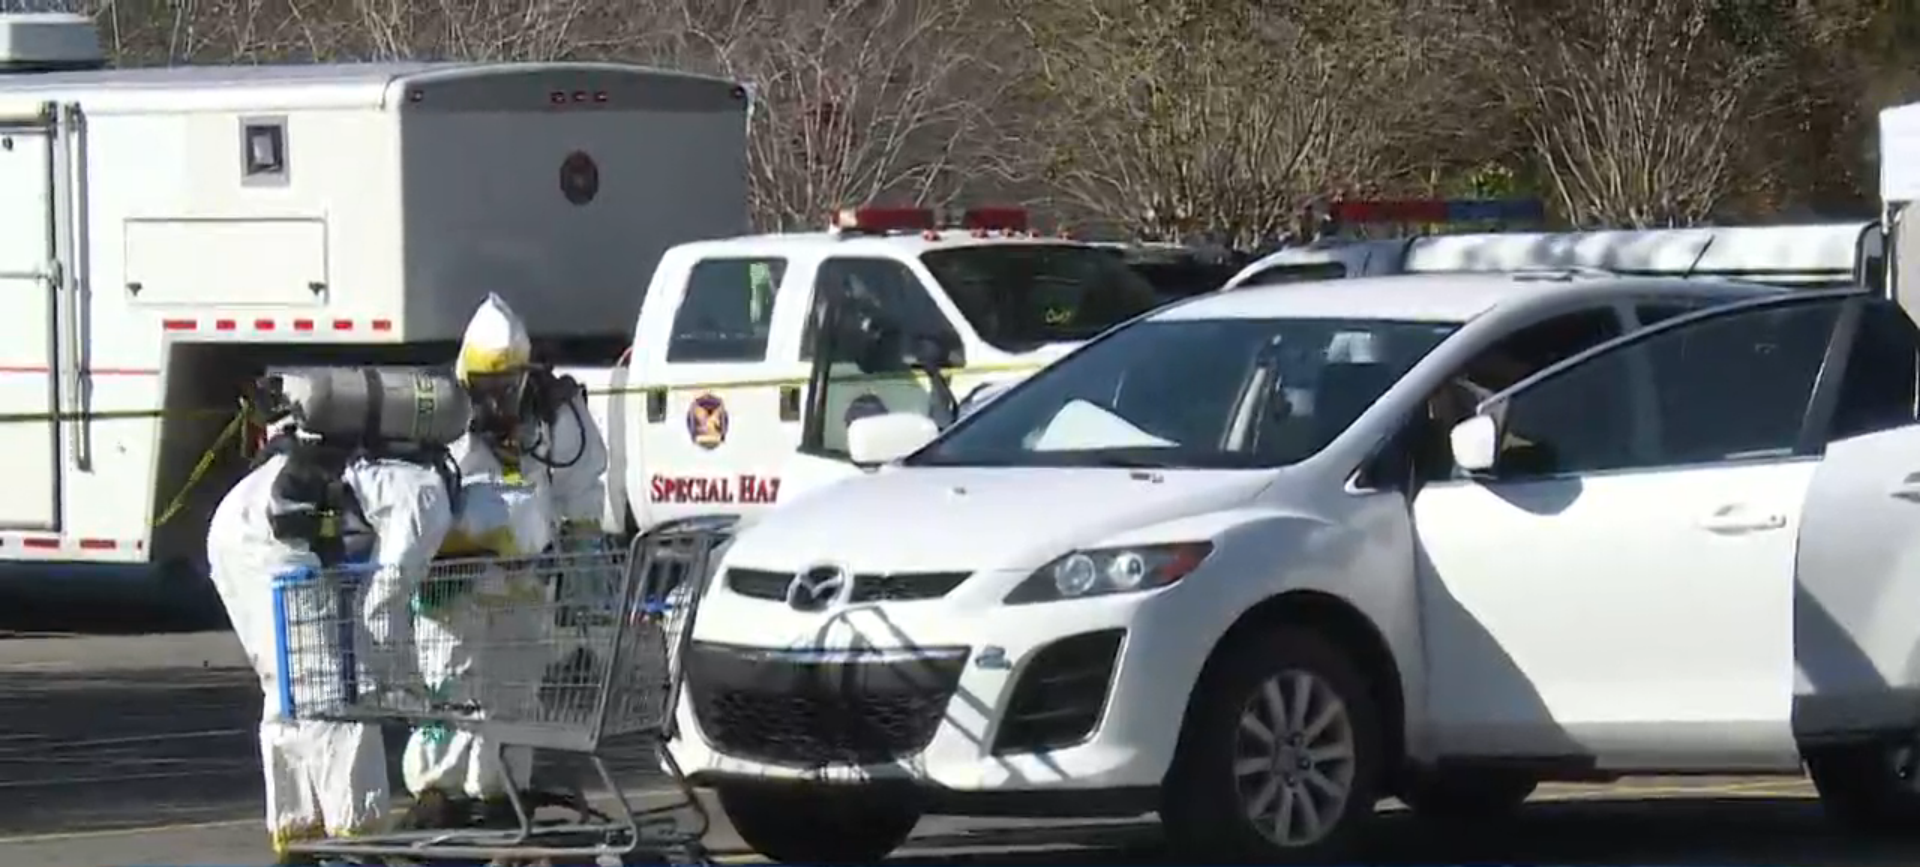 Mobile Meth Lab Found In Mazda Boot In WalMart Car Park